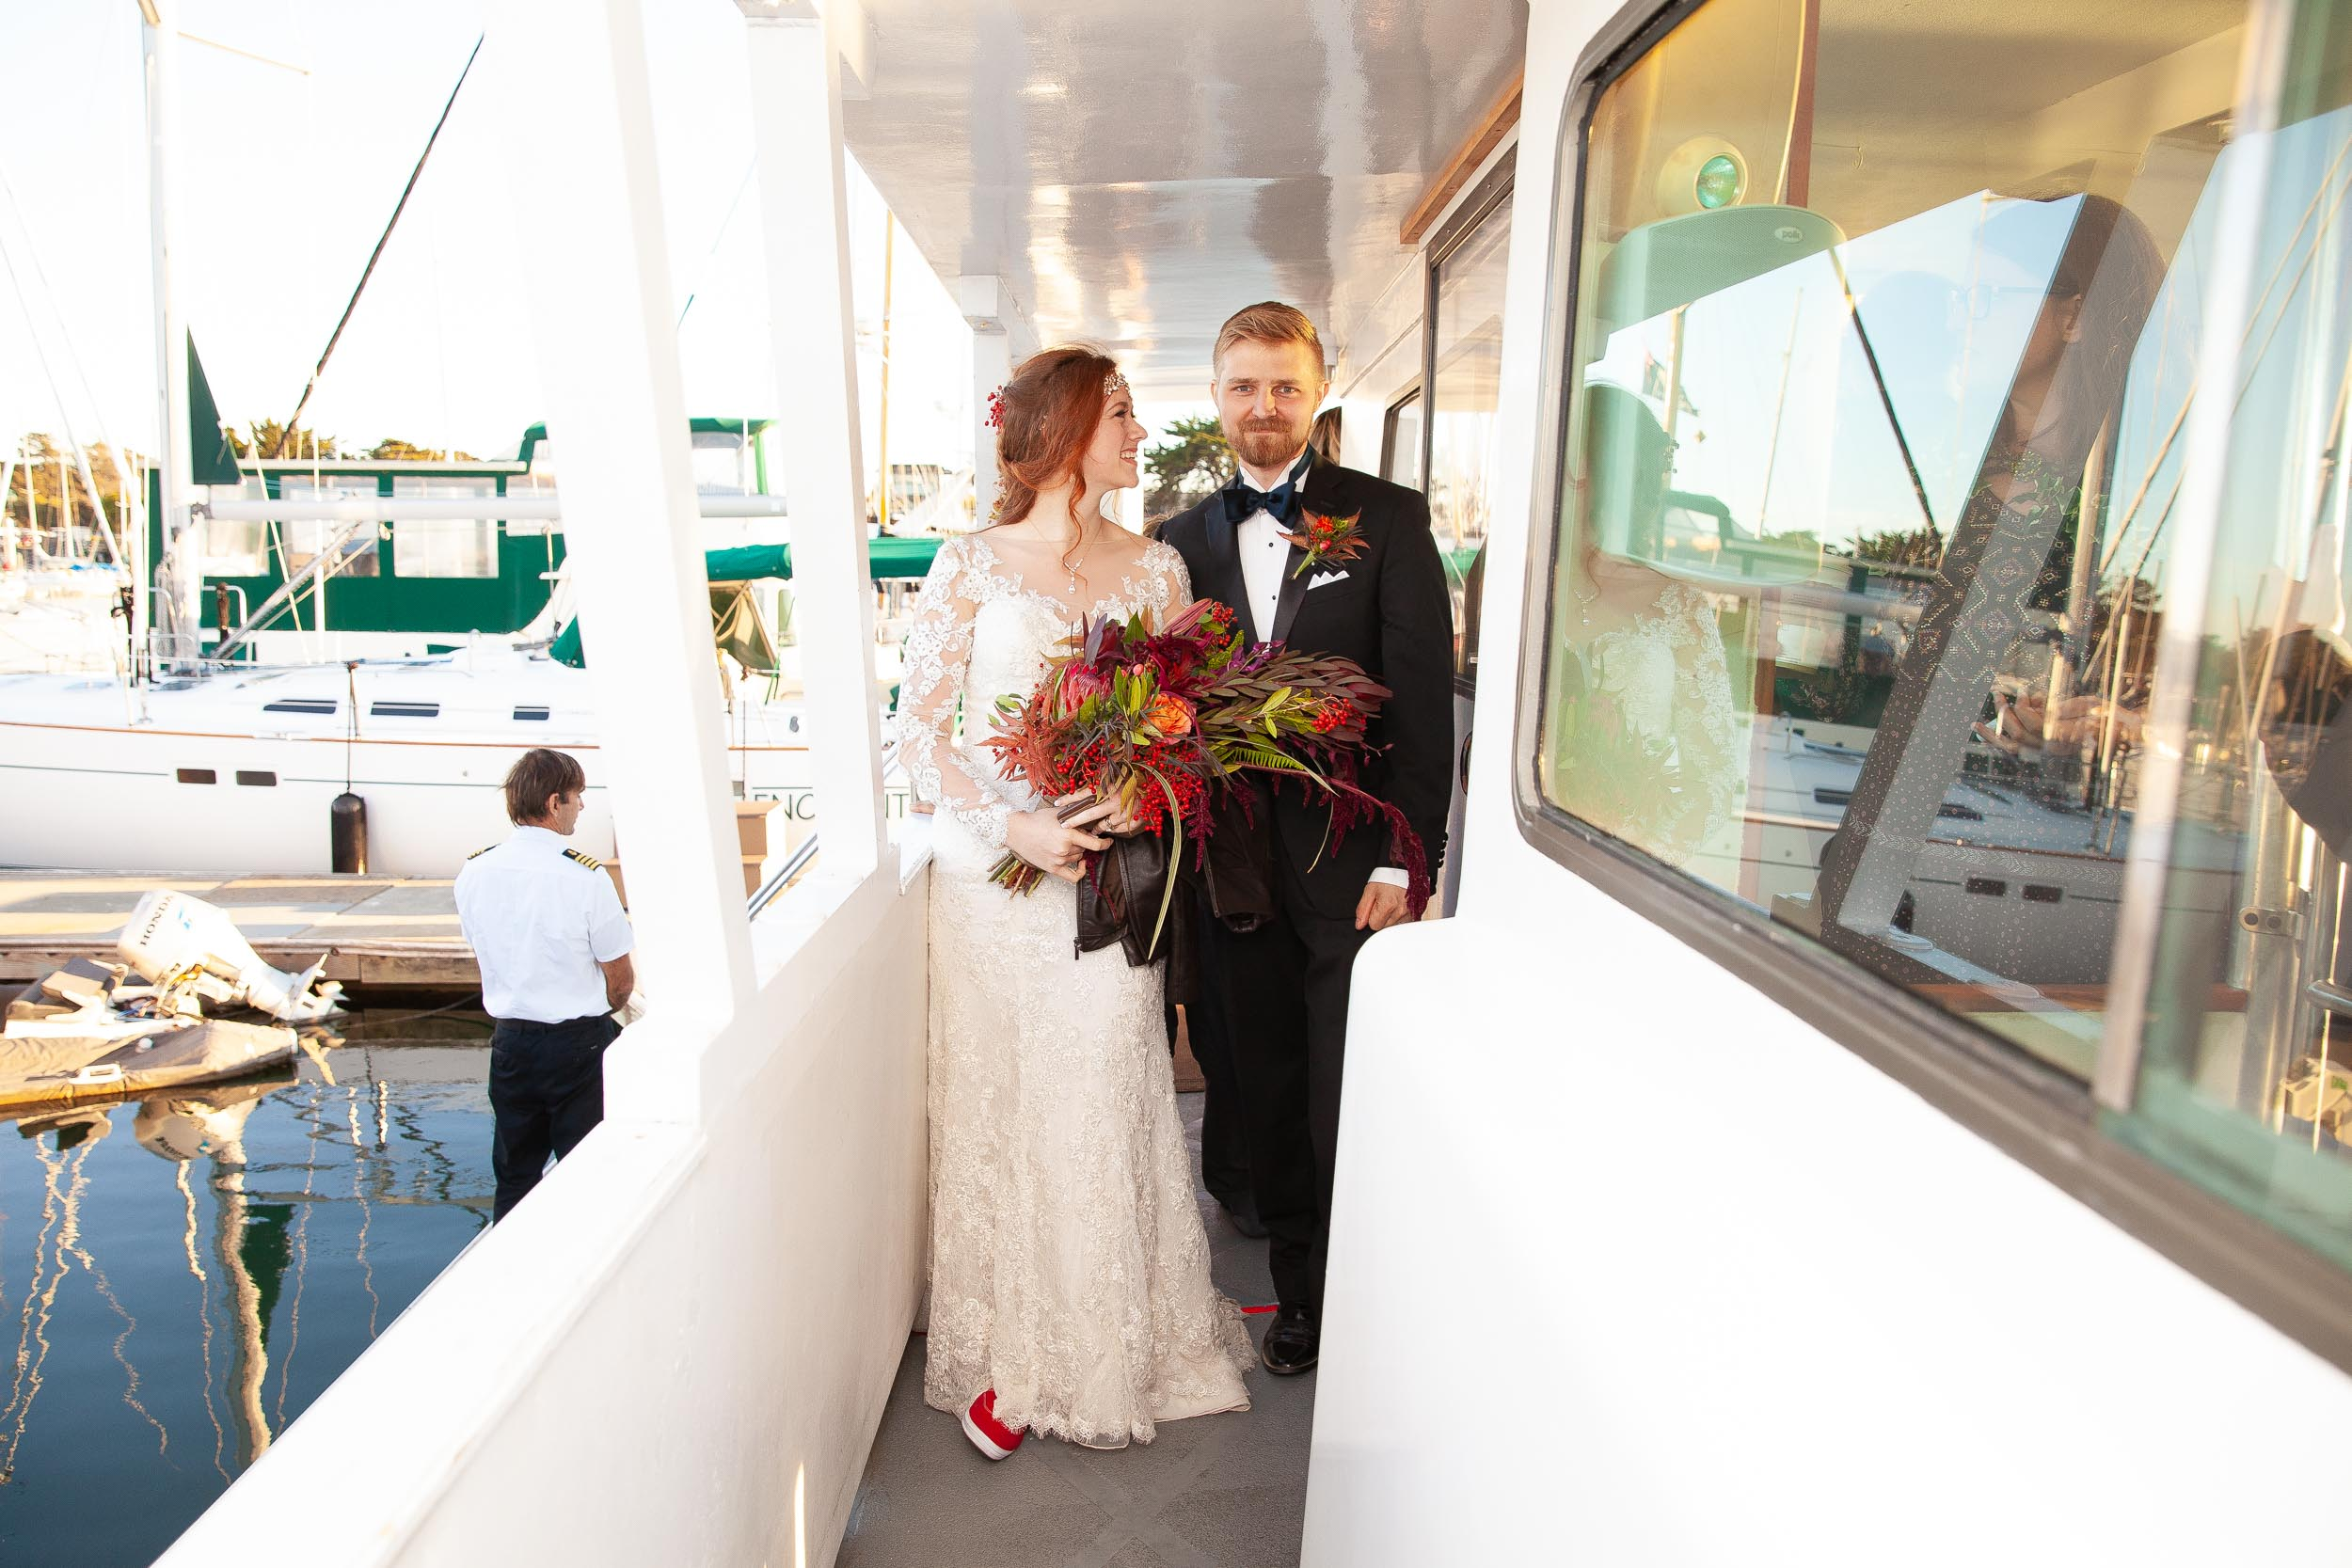 Berkeley Botanical Garden Wedding Ceremony in the Redwood Grove Ceremony and SF Bay Wedding Cruise Reception-64.jpg